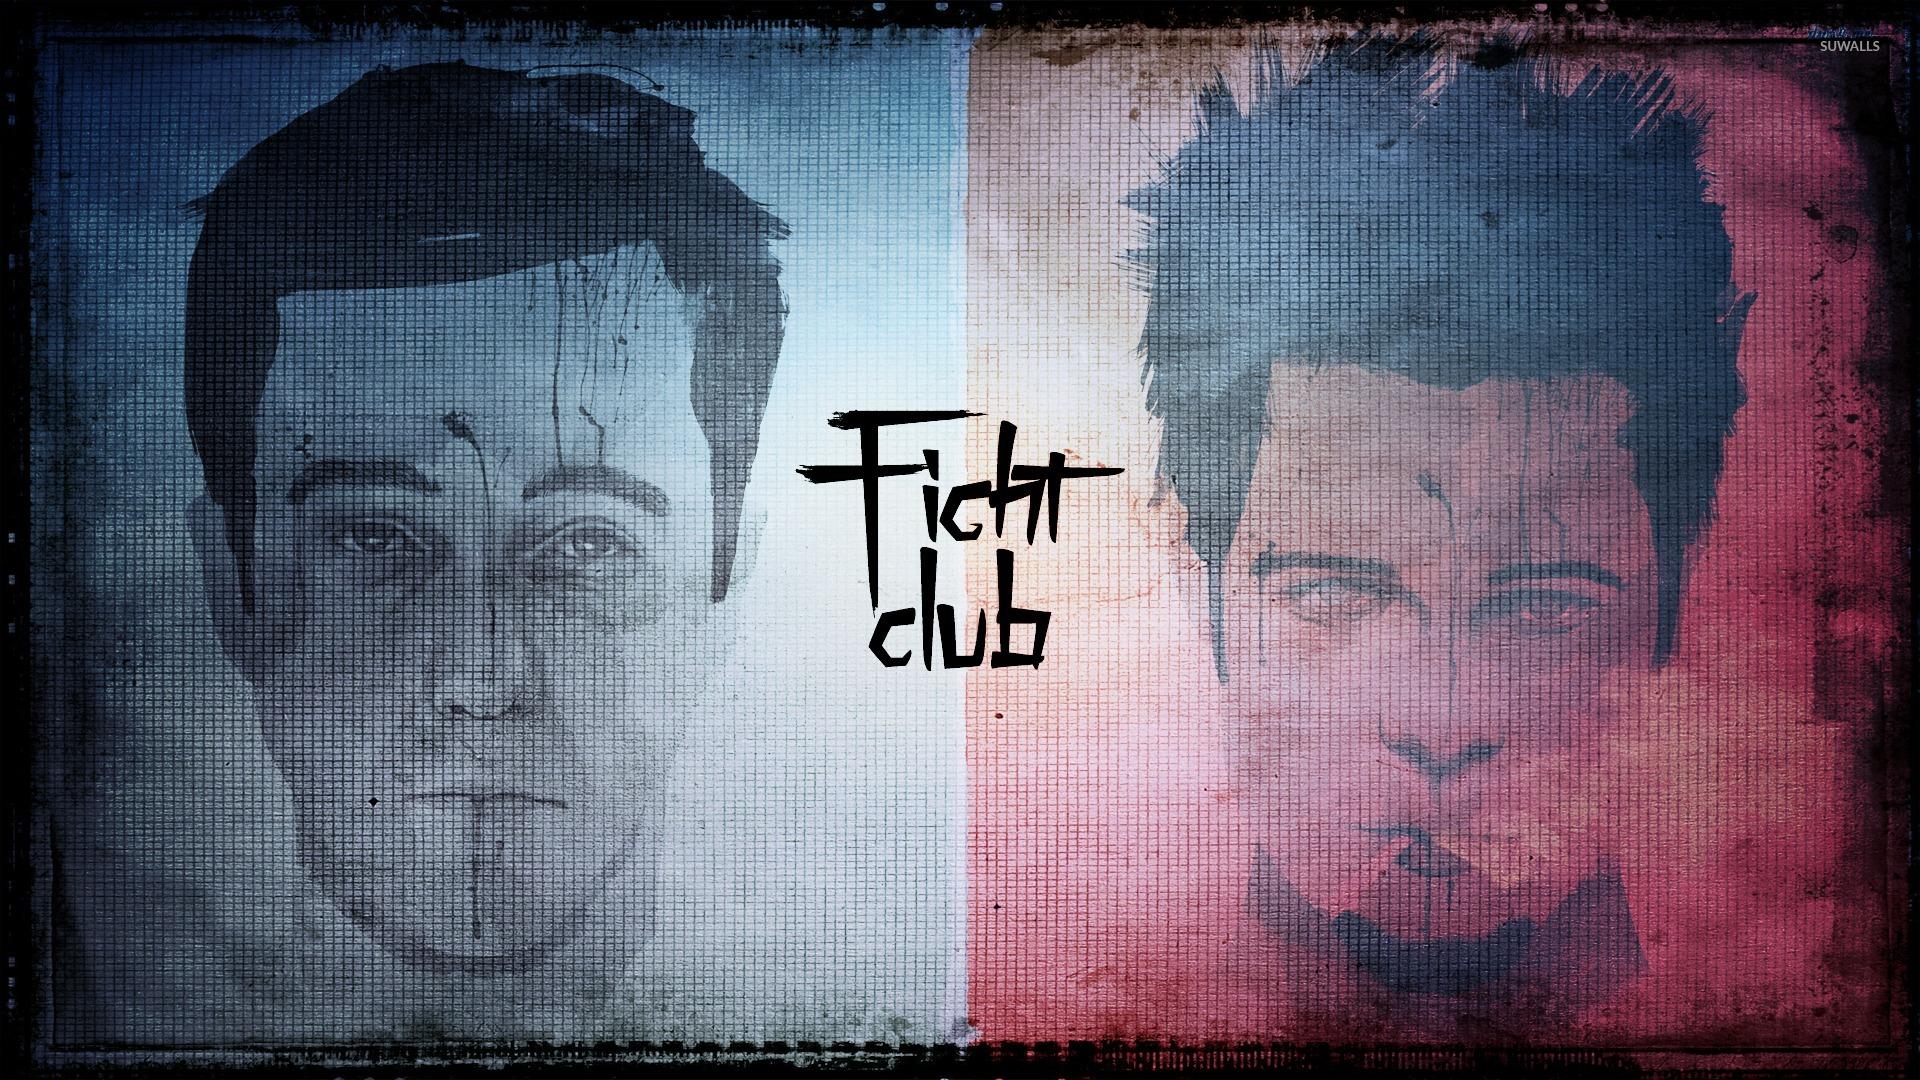 Fight Club wallpaper   Movie wallpapers   31005 1920x1080